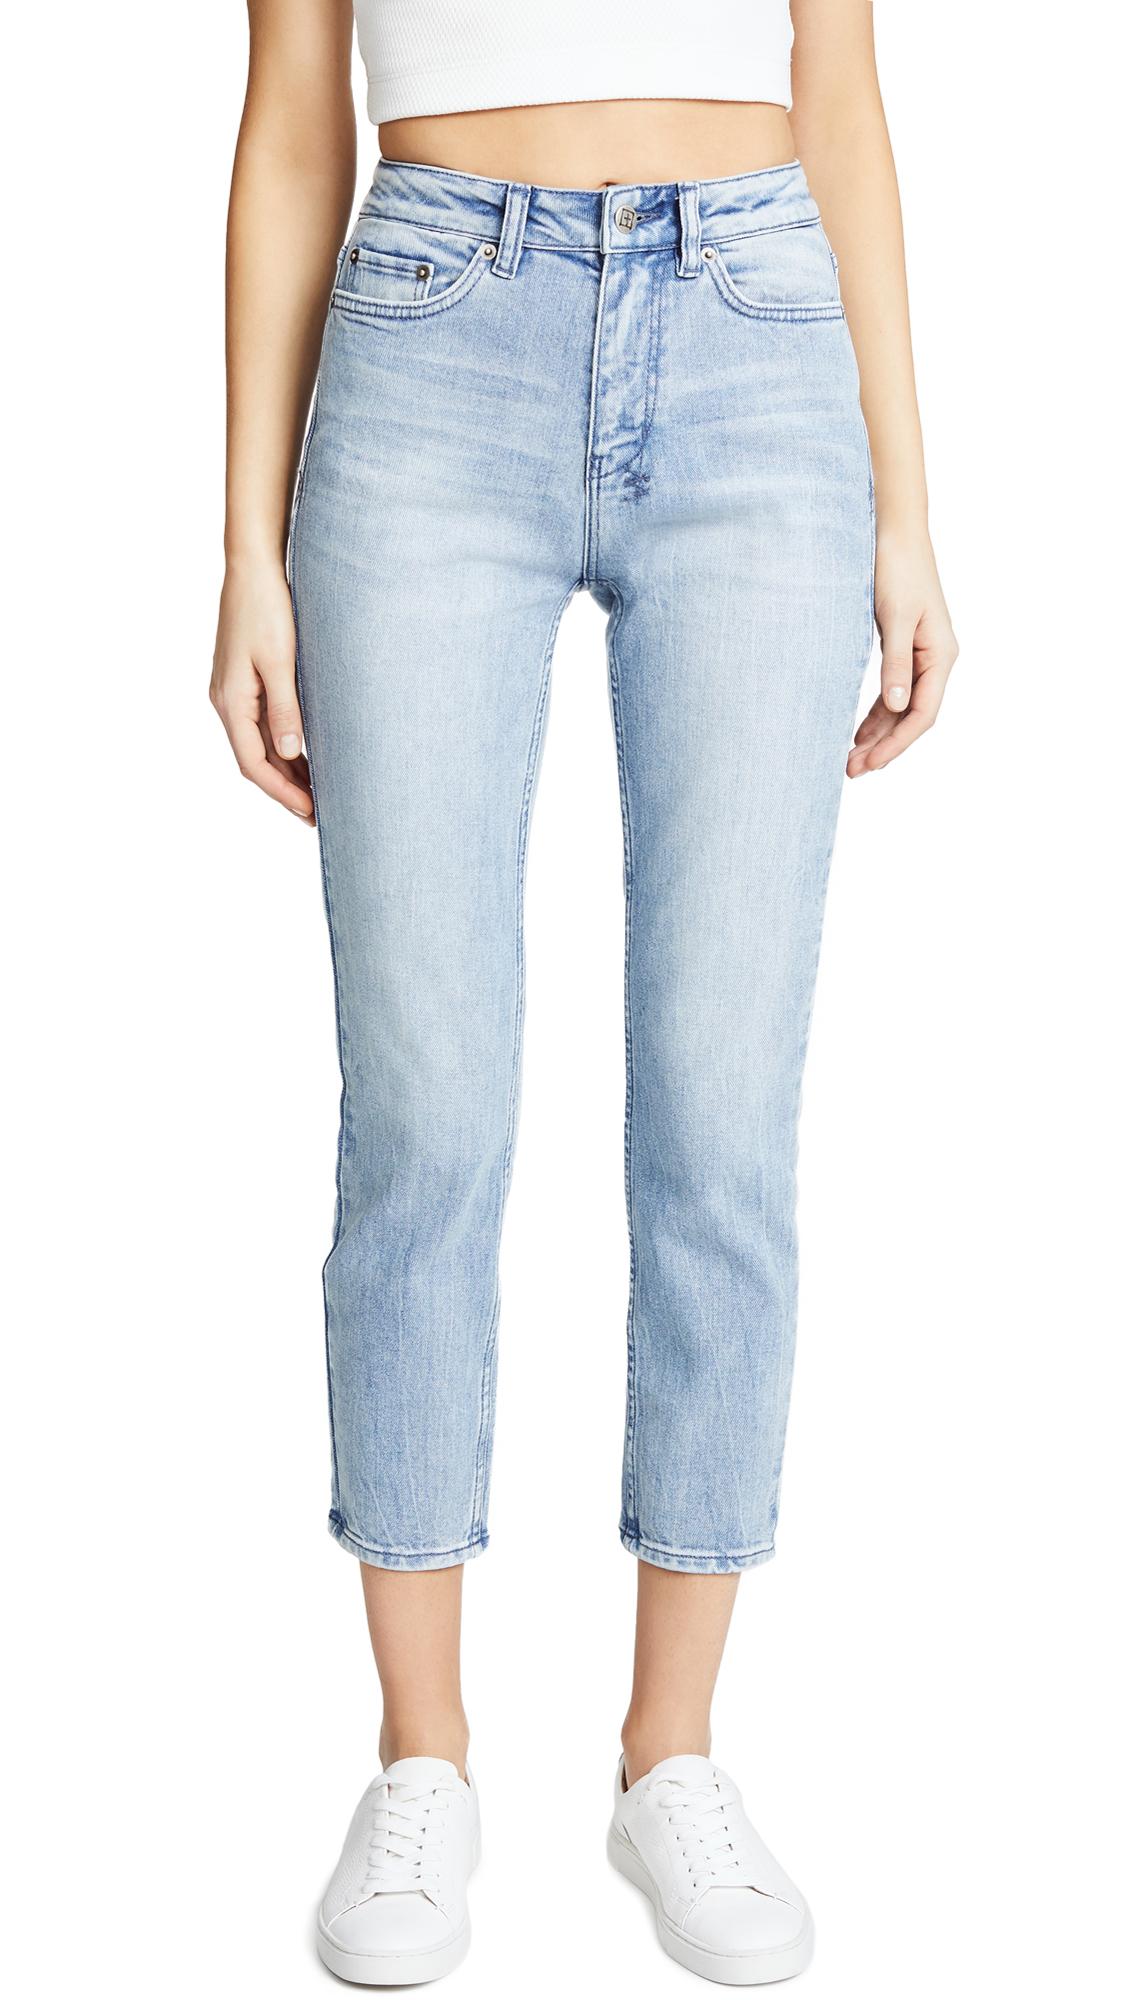 Ksubi The Slim Pin Crop Jeans In Errrday Blue